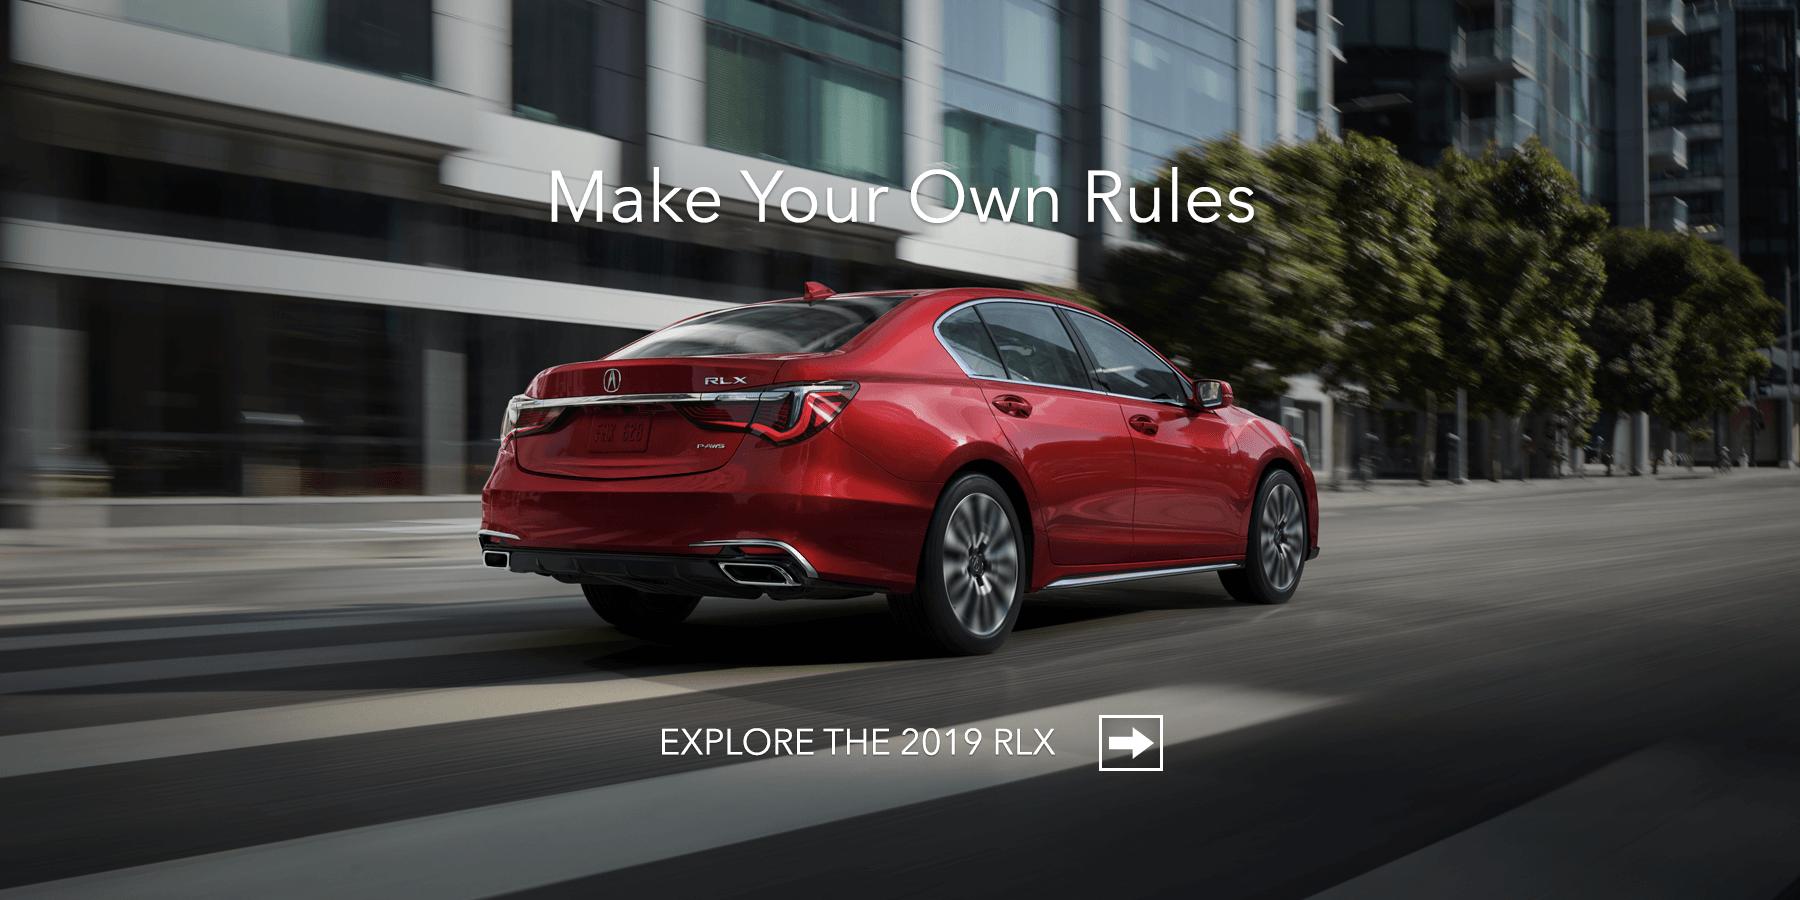 2019 Acura RLX Brilliant Red Metallic Rear Angle HP Slide